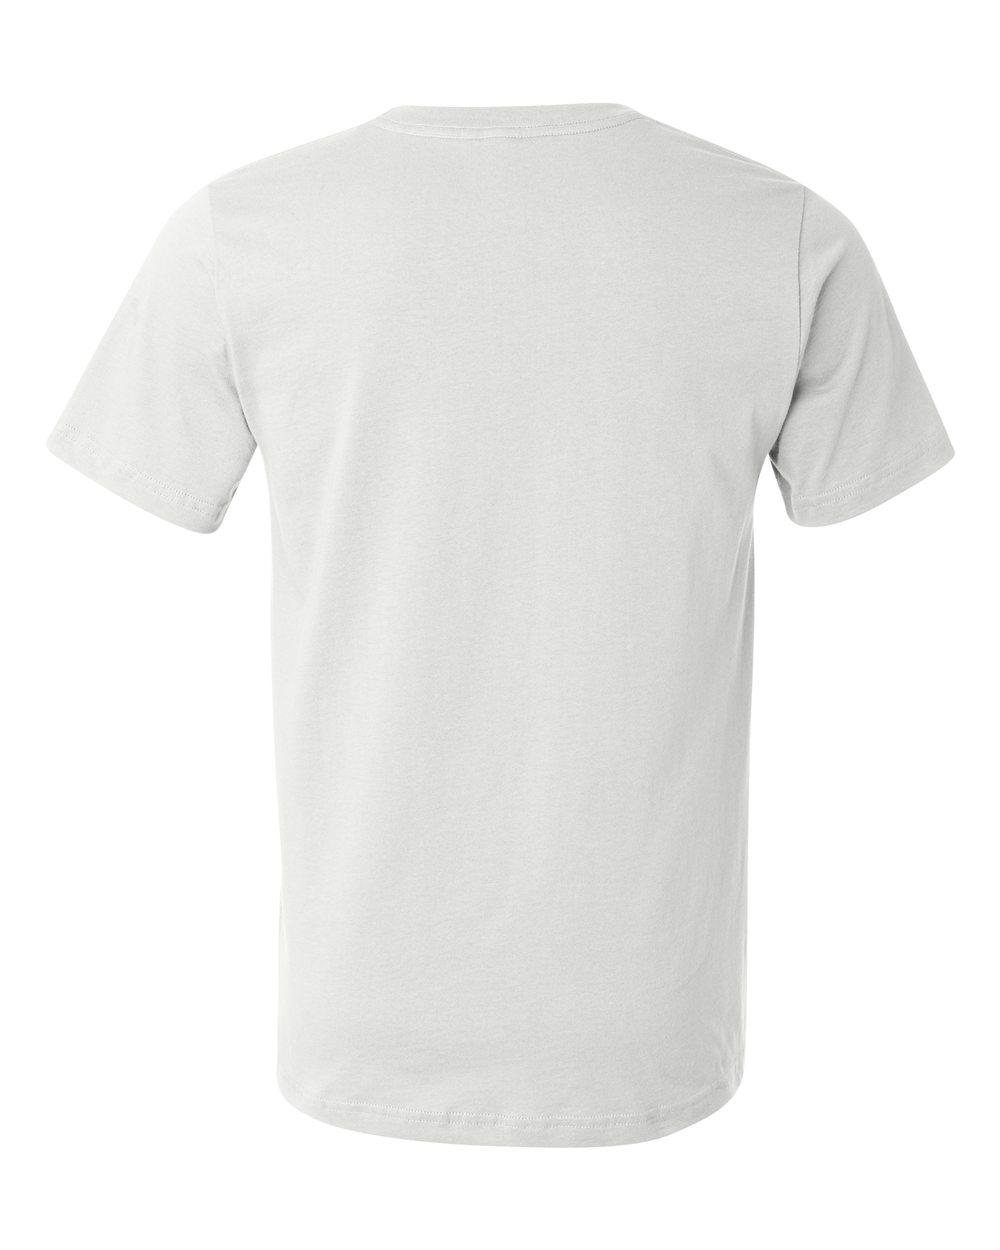 Bella-Canvas-Unisex-Made-in-USA-Jersey-Short-Sleeve-T-Shirt-3001U-XS-3XL thumbnail 13